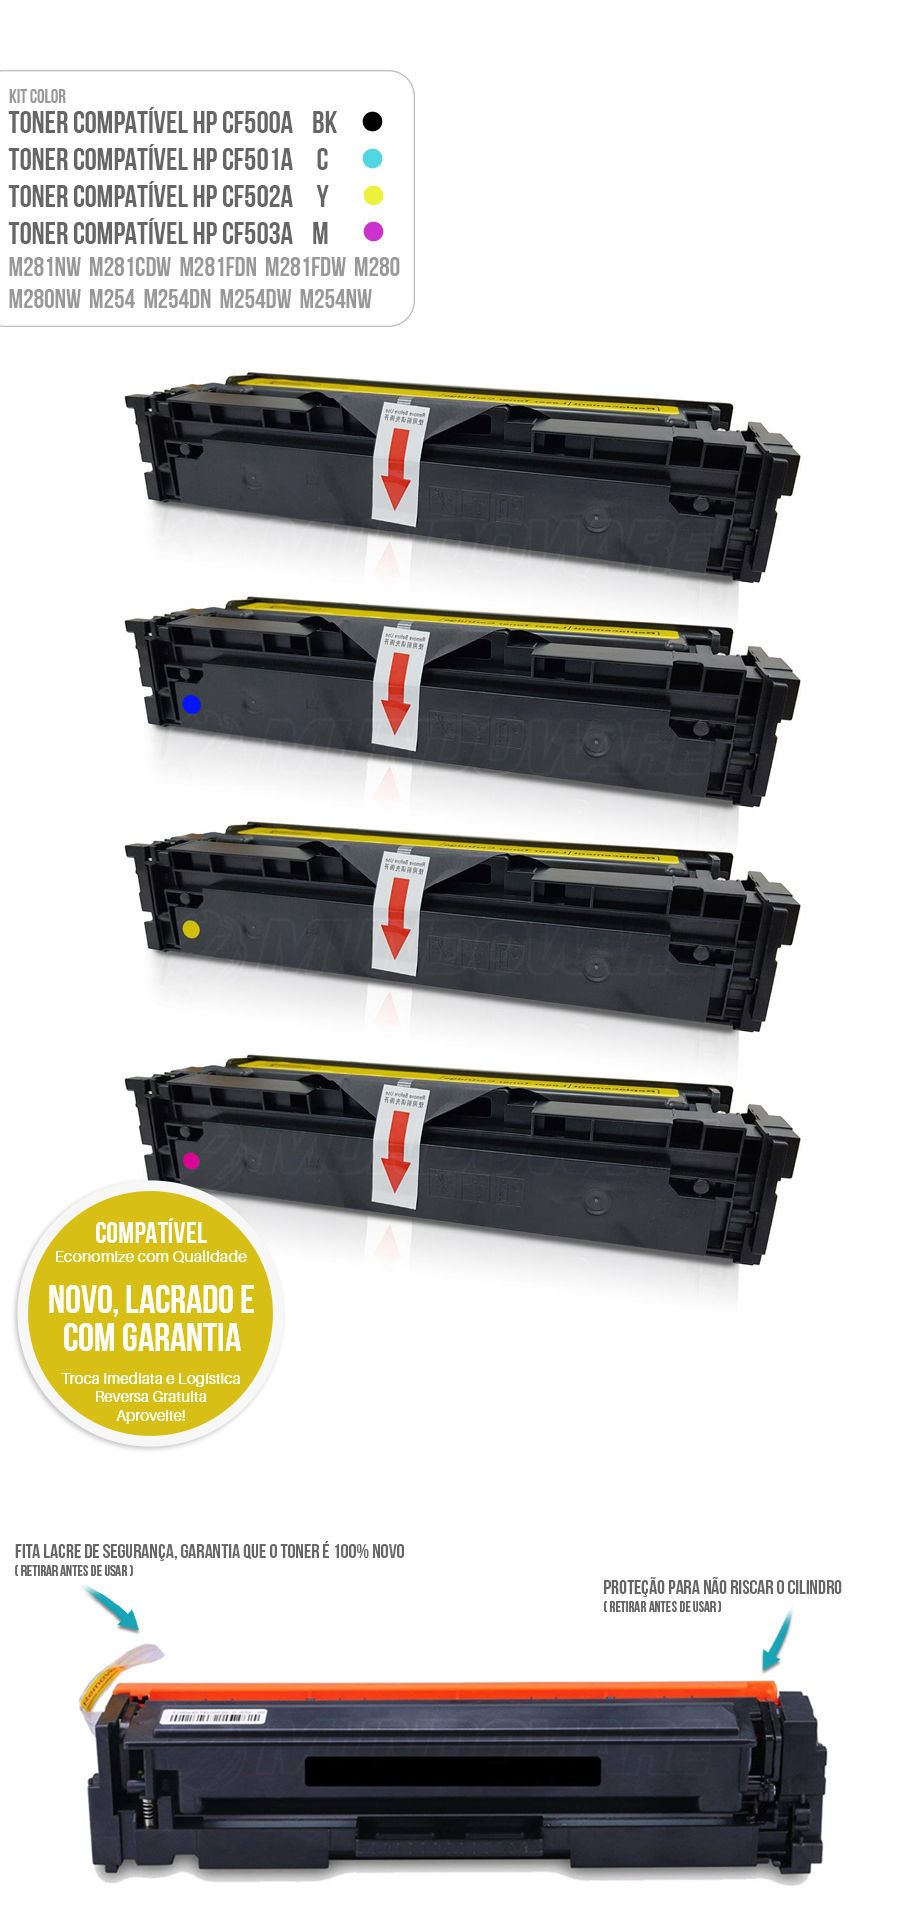 Kit Colorido de Toner compatível com CF500A 500A para impressora HP M281 M281nw M281cdw M281fdn M281fdw M280 M280nw M254 M254dn M254dw M254nw Tonner